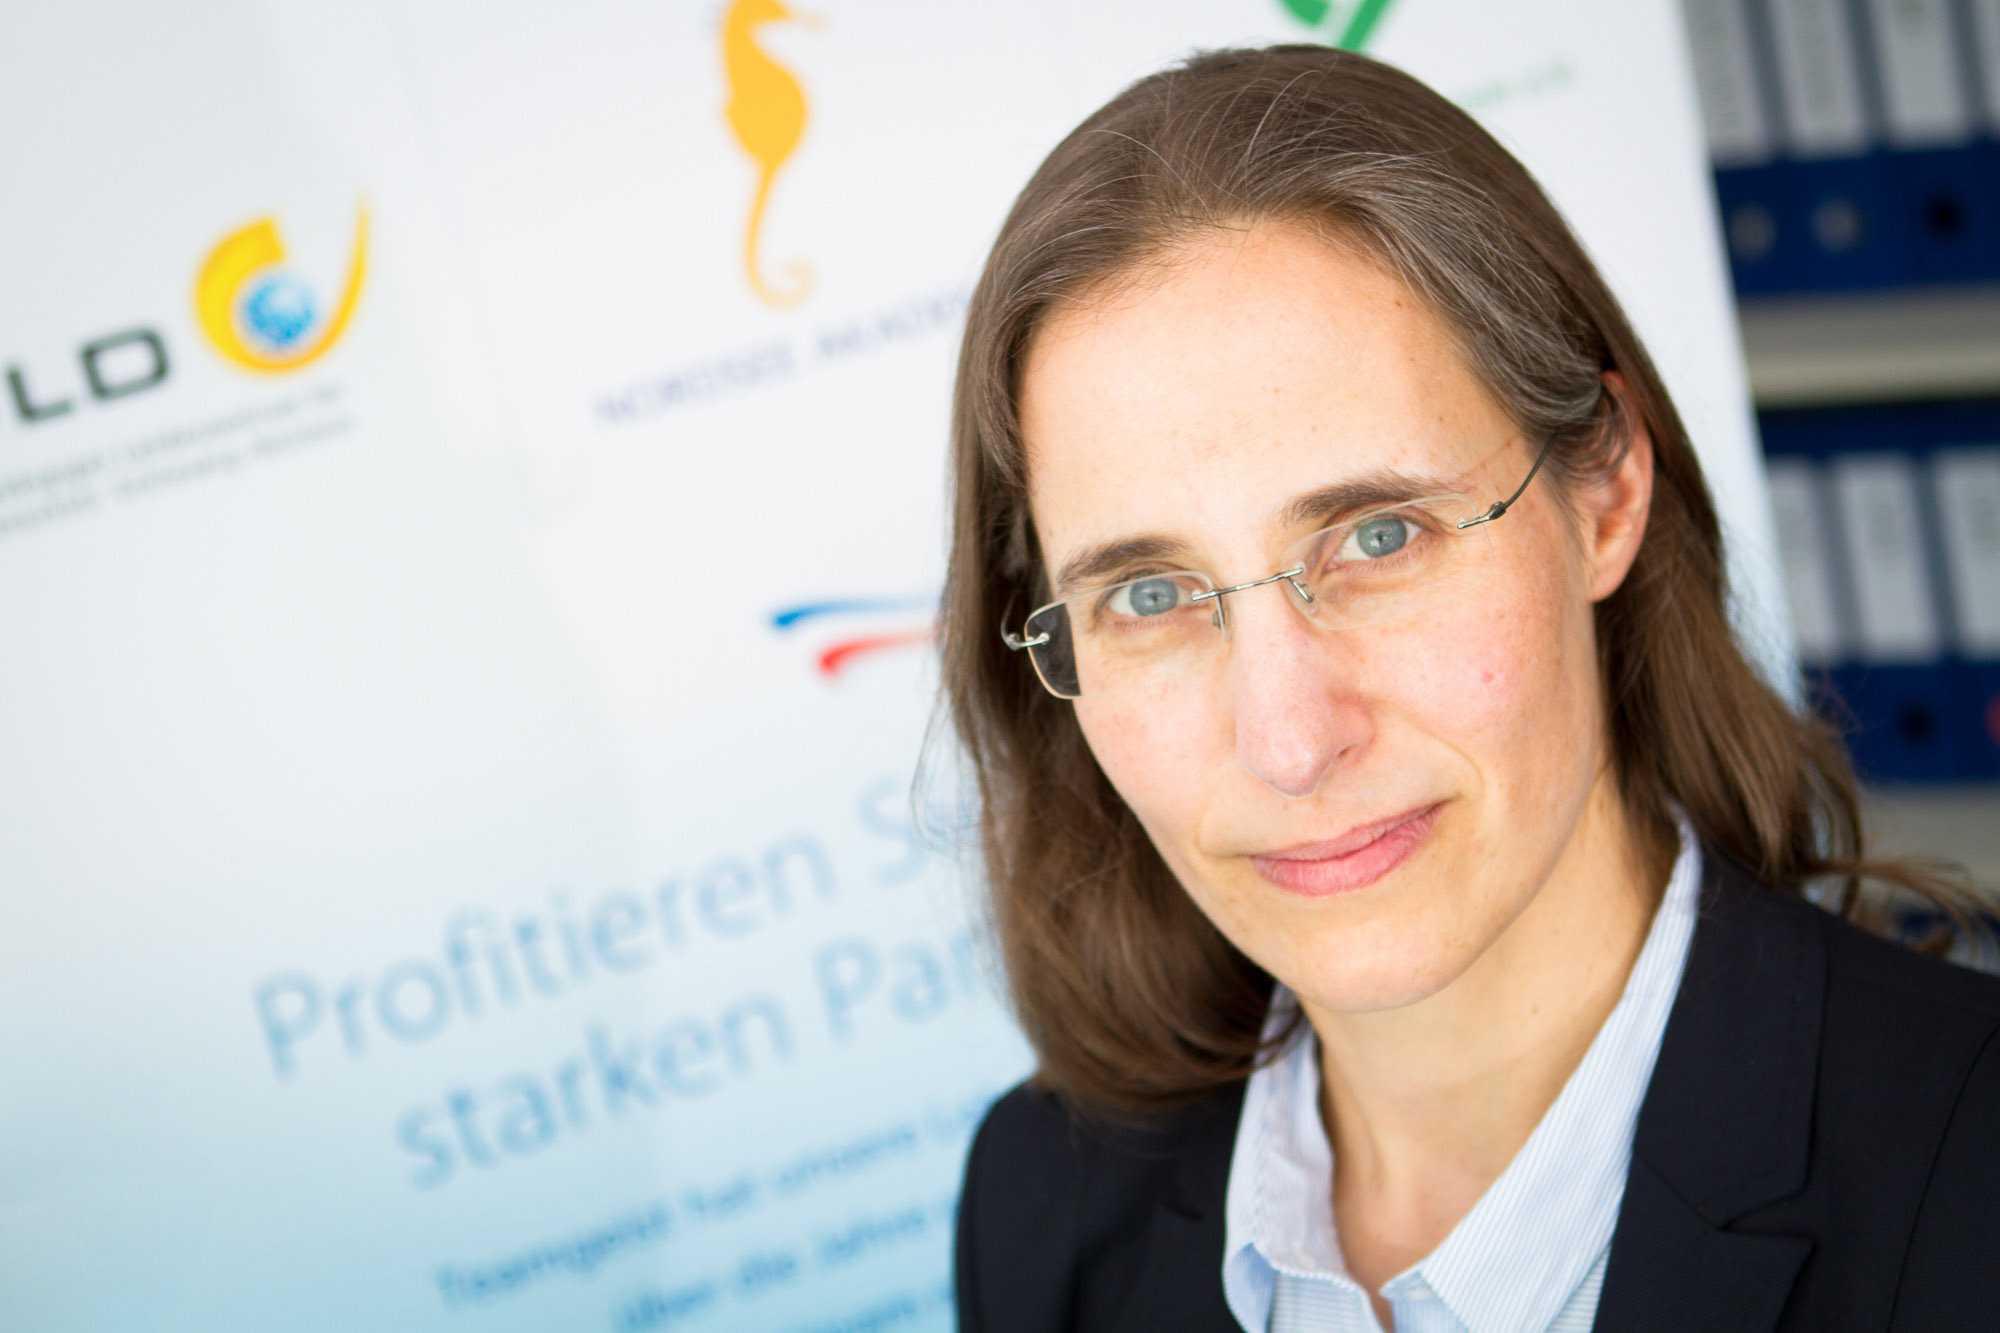 Deutschlands prominentester Datenschützer geht mit Verärgerung